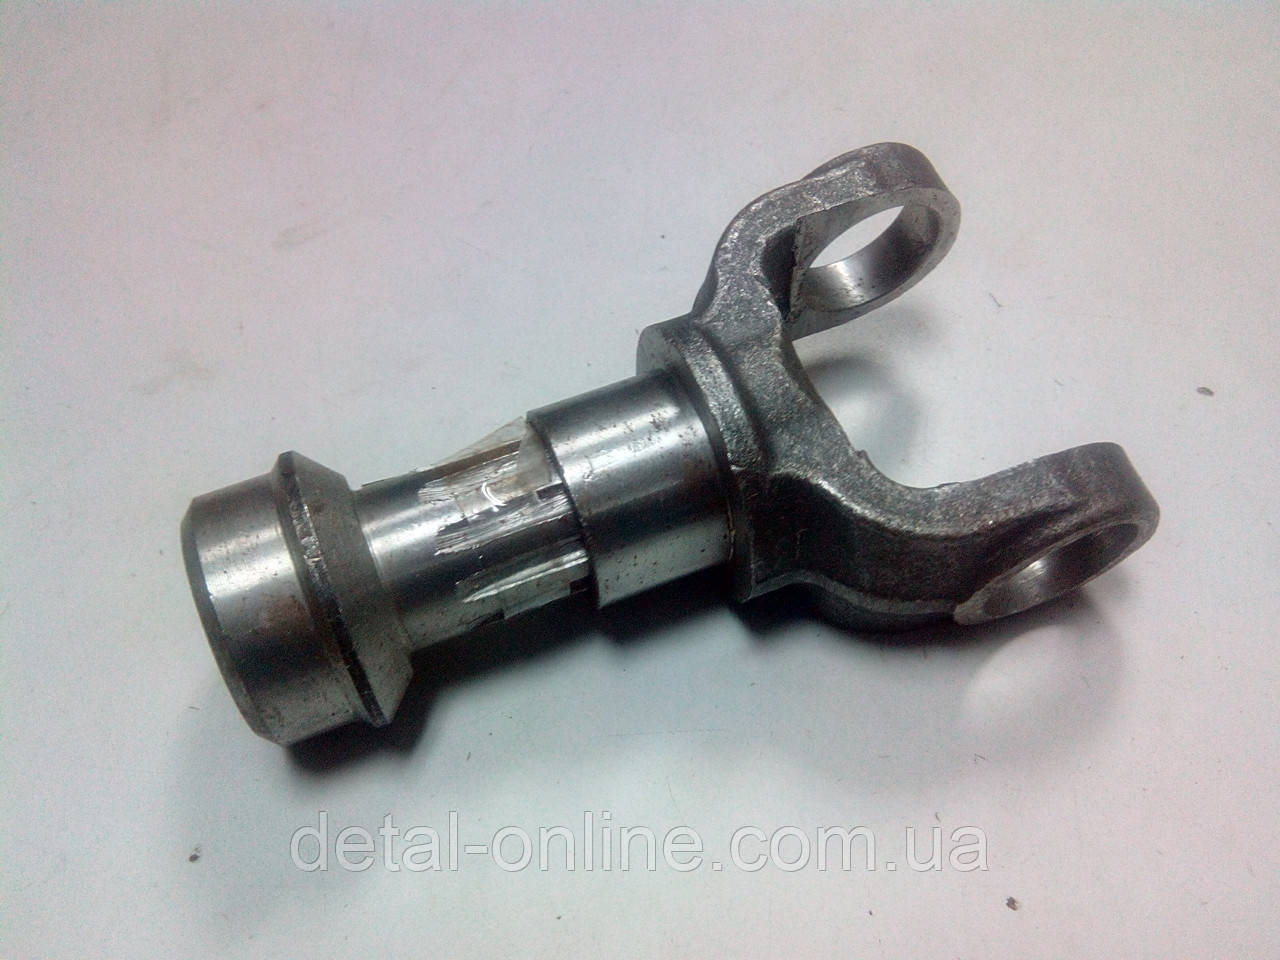 24-2201023-13 ремкомлпект вилки карданного.вала /вилка+шлиц/